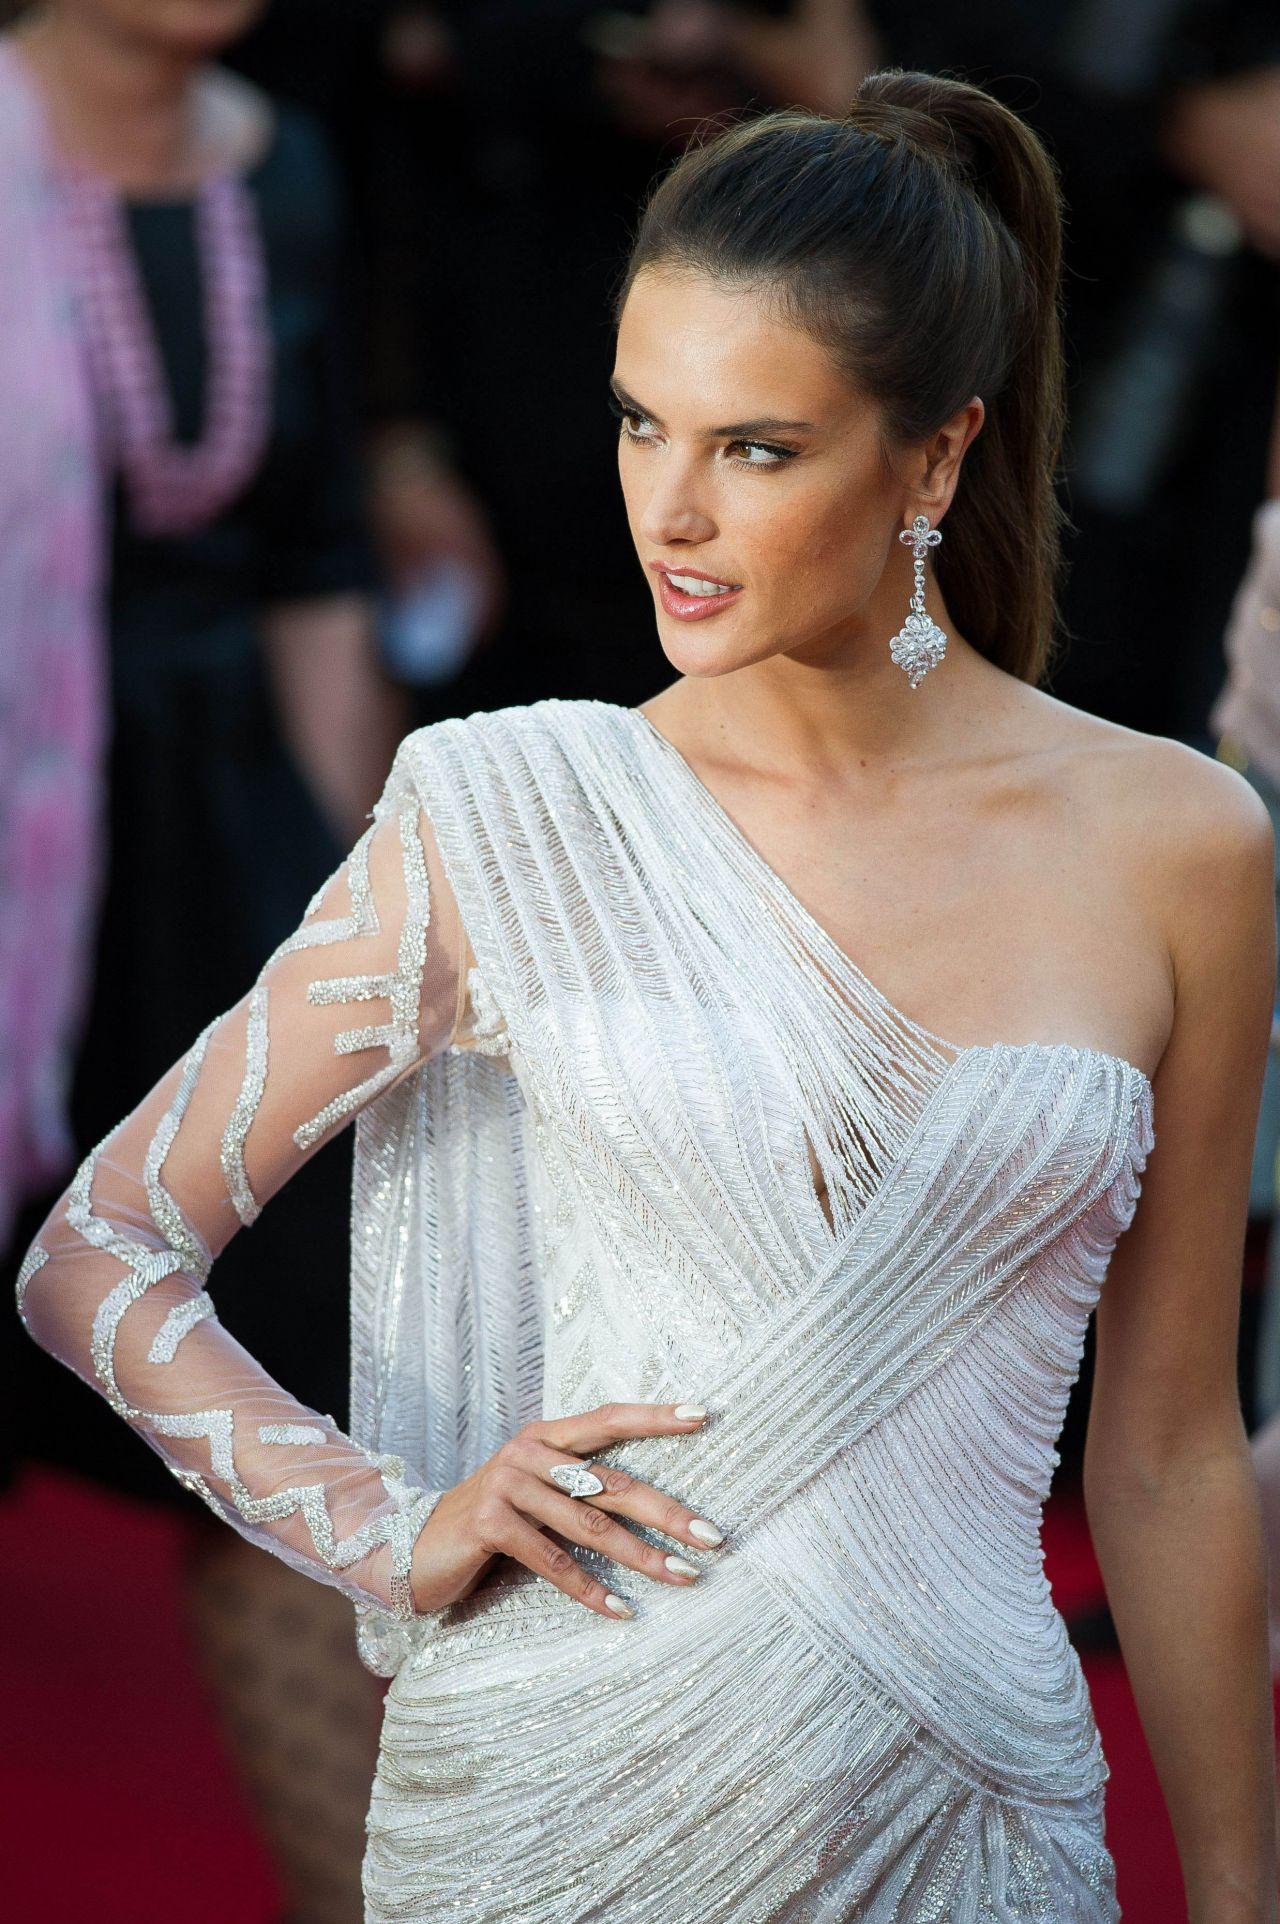 Alessandra Ambrosio Wearing Atelier Versace Dress Two